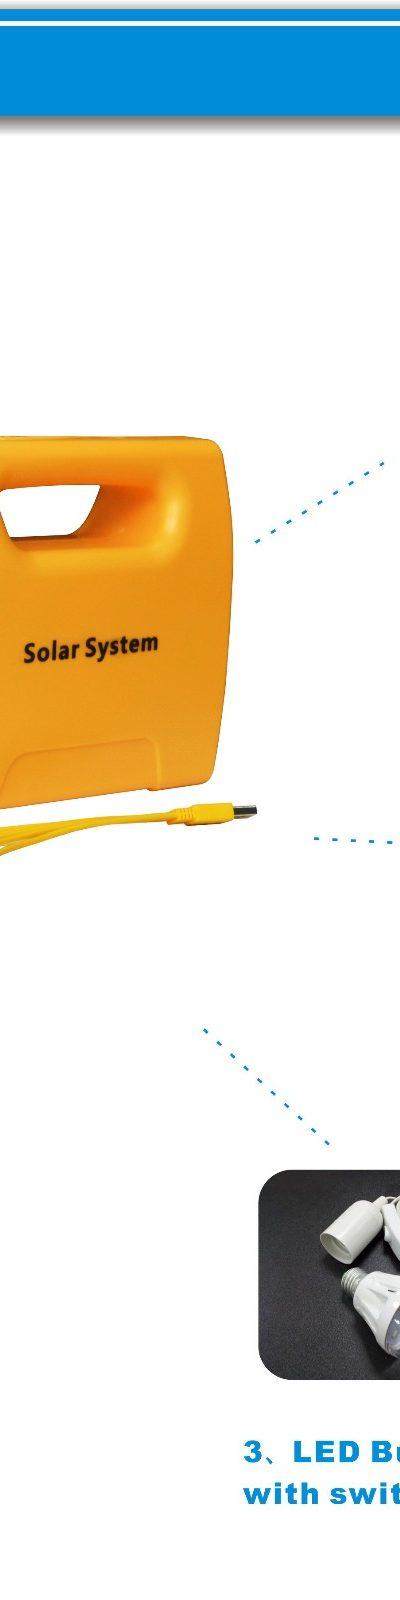 Produk solar panel Jarwinn 10